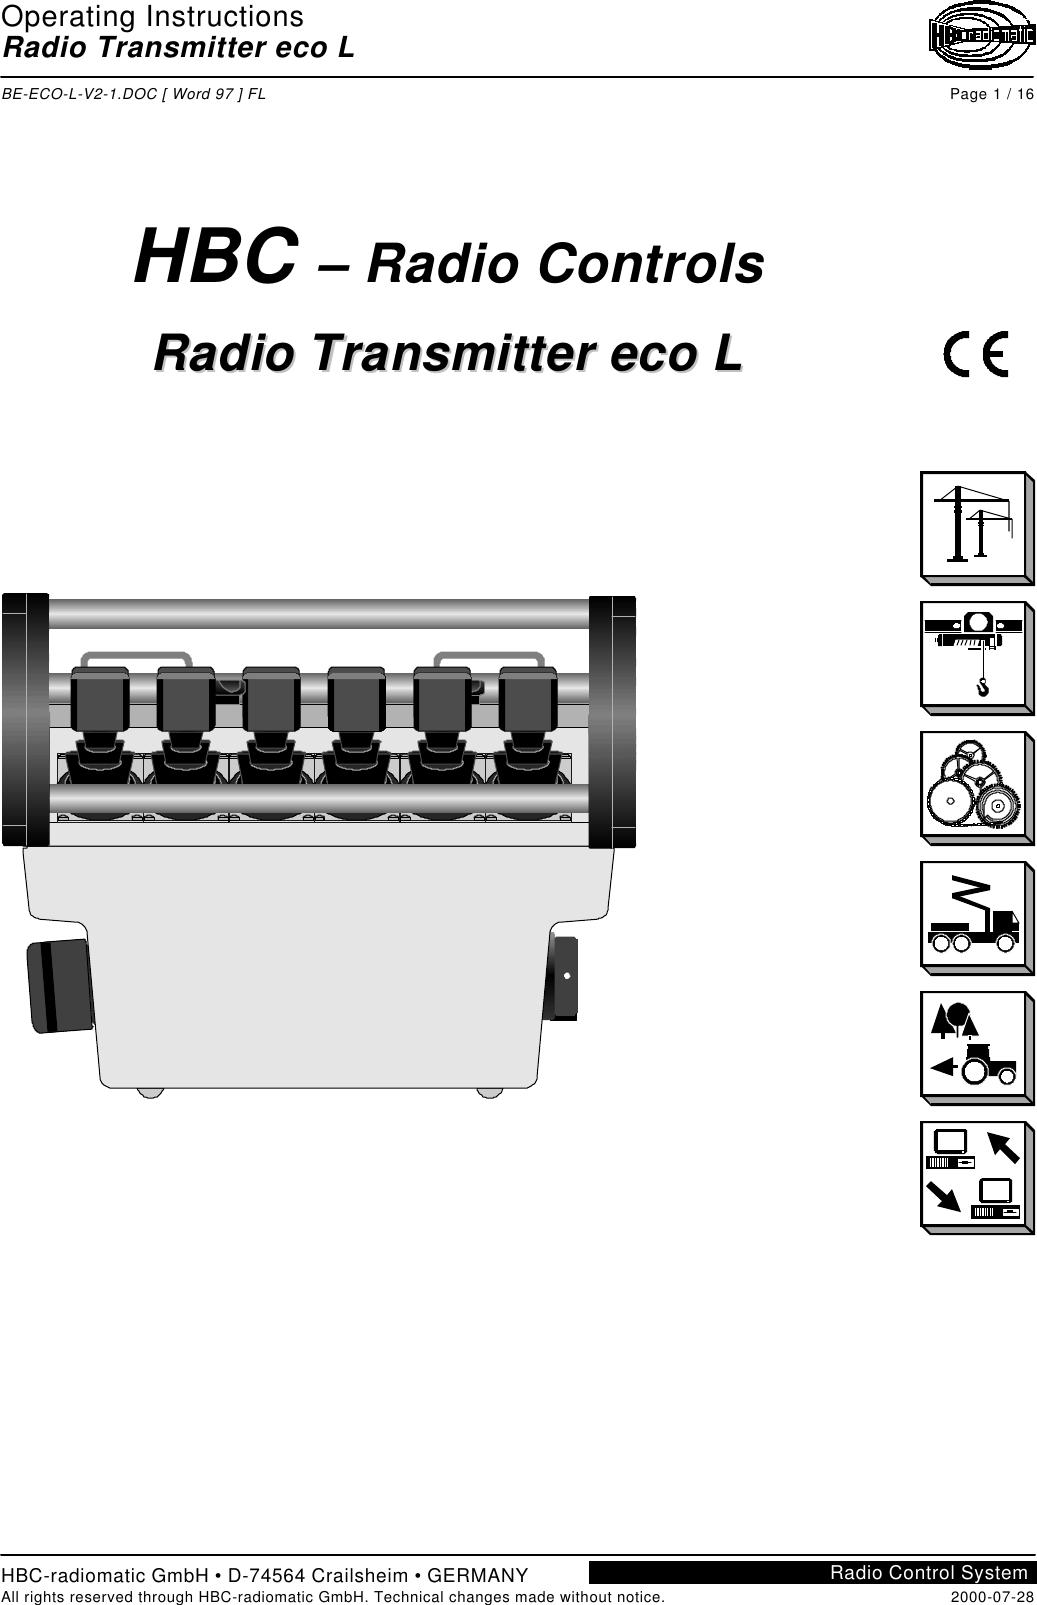 HBC radiomatic E20004 Crane Remote Control Transmitter